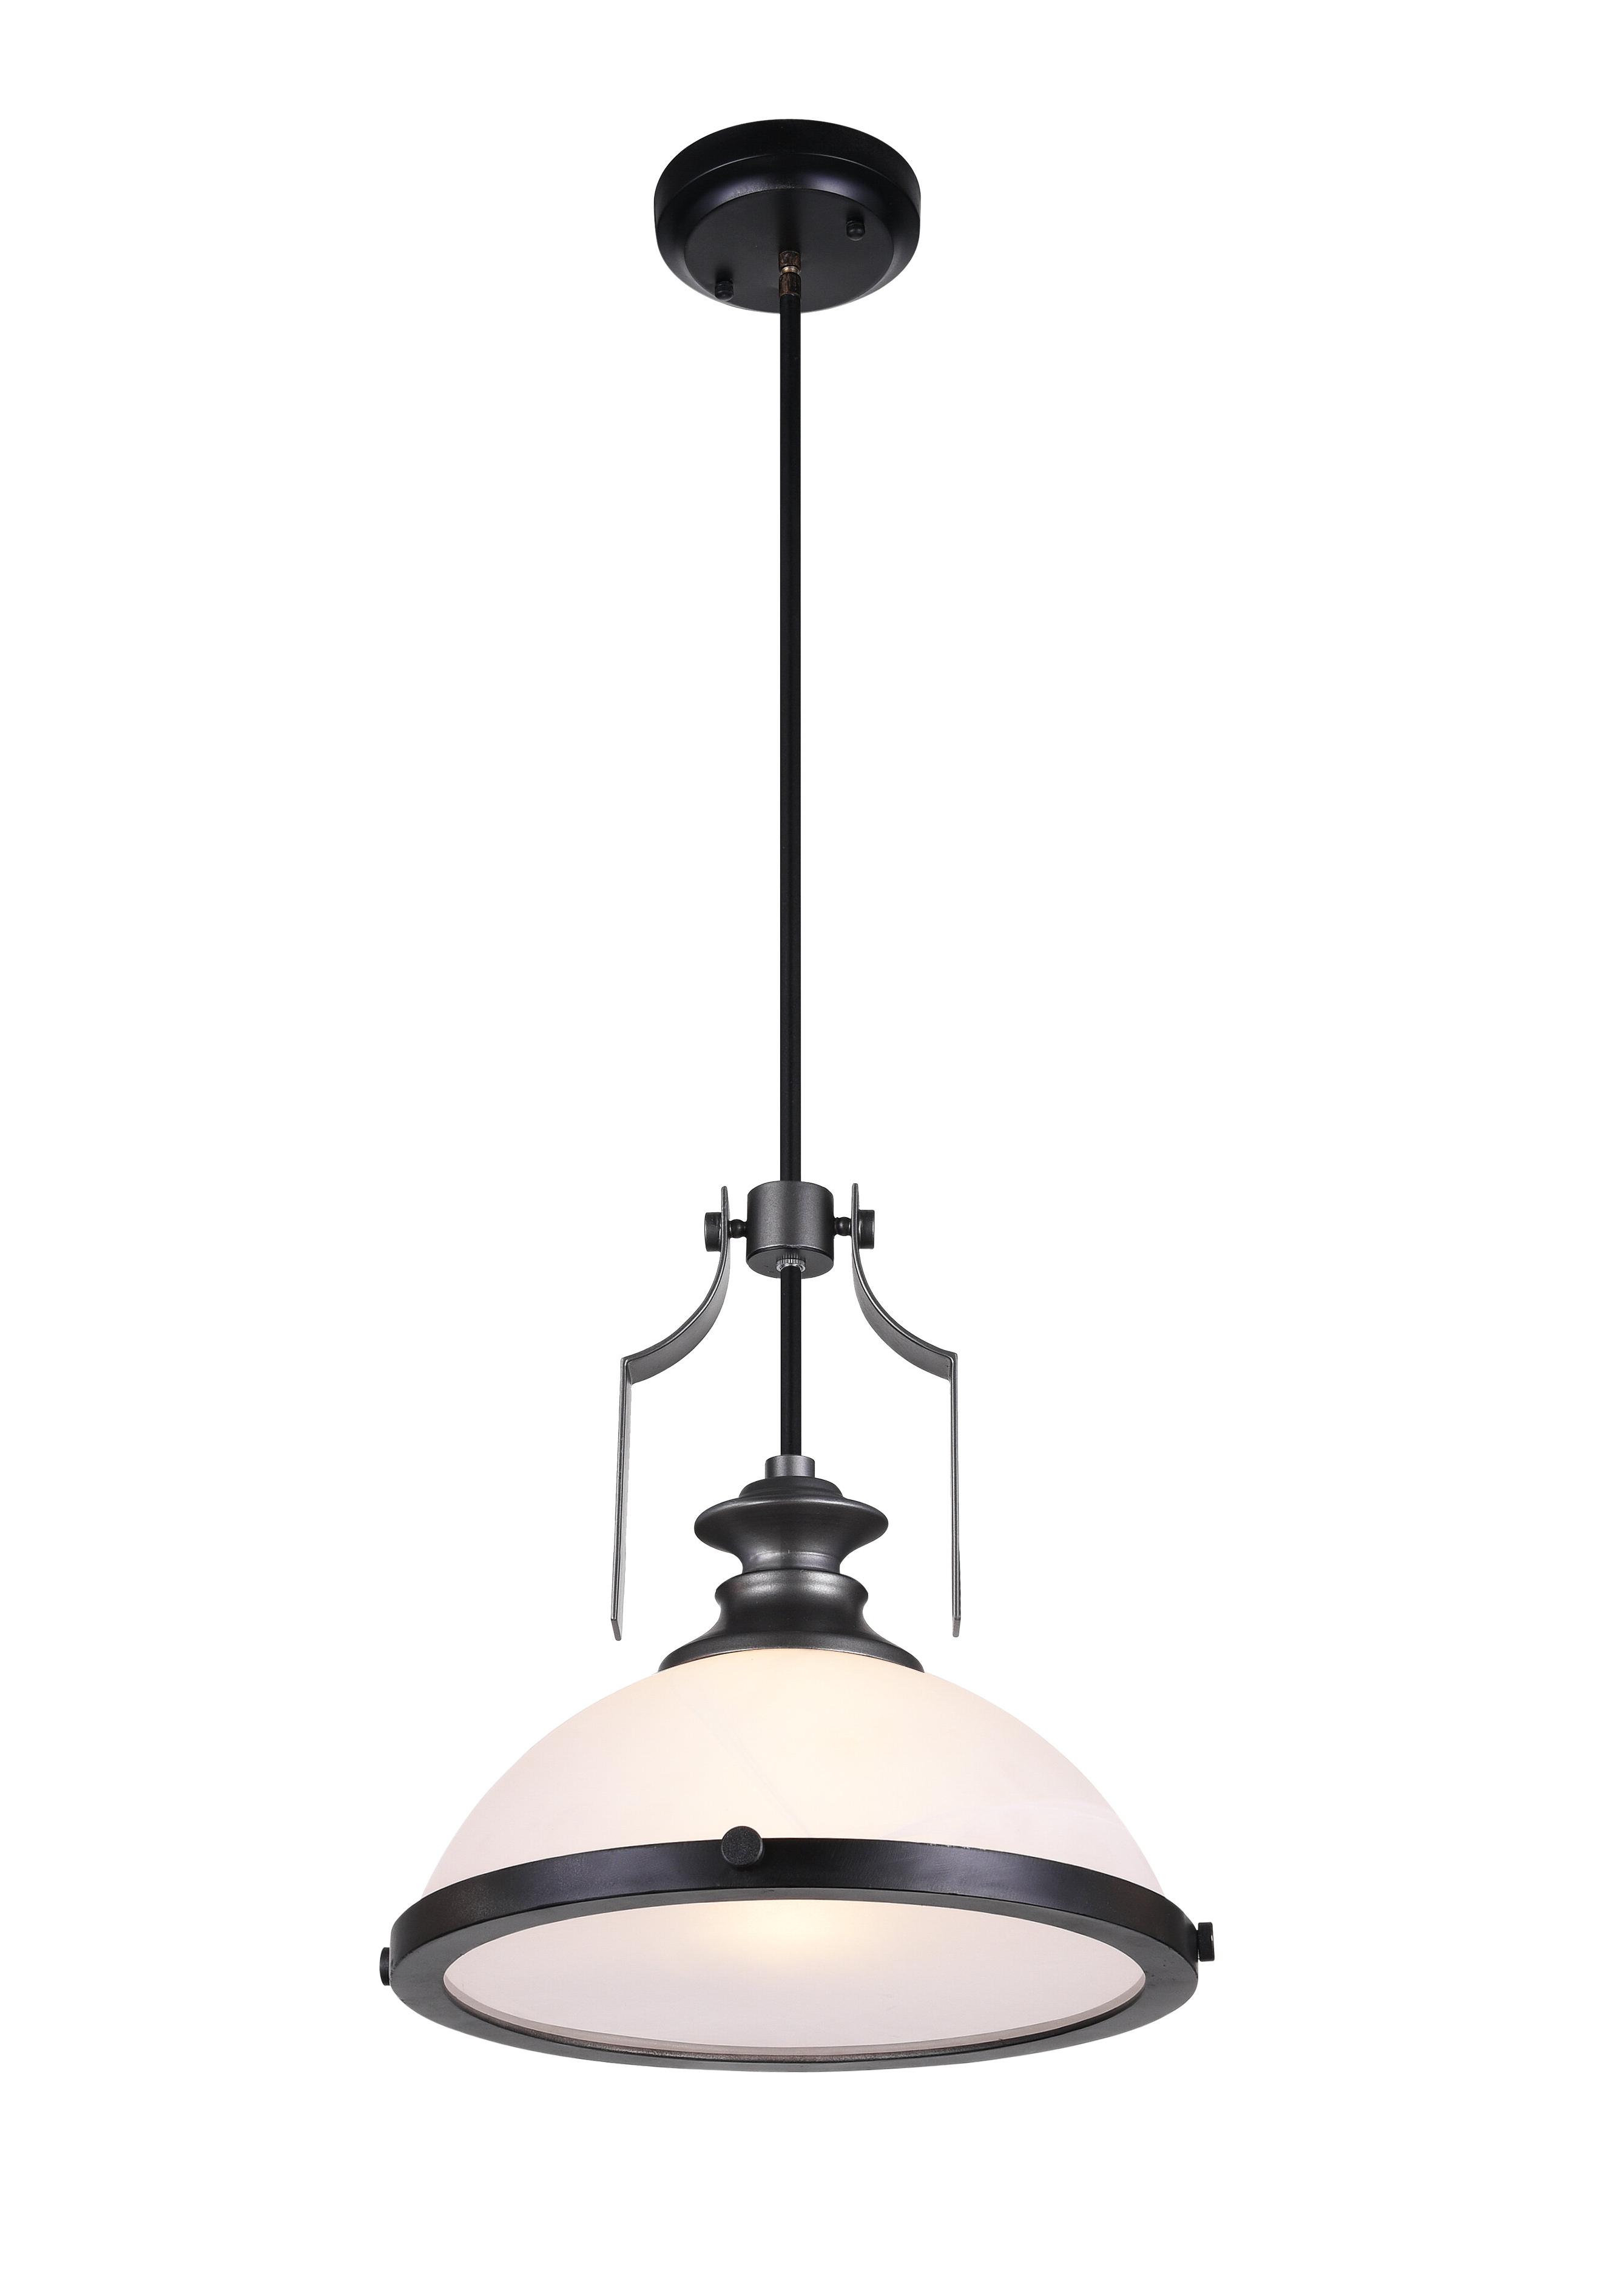 Terry 1 Light Single Bell Pendants In Preferred Detti 1 Light Dome Pendant (View 8 of 20)